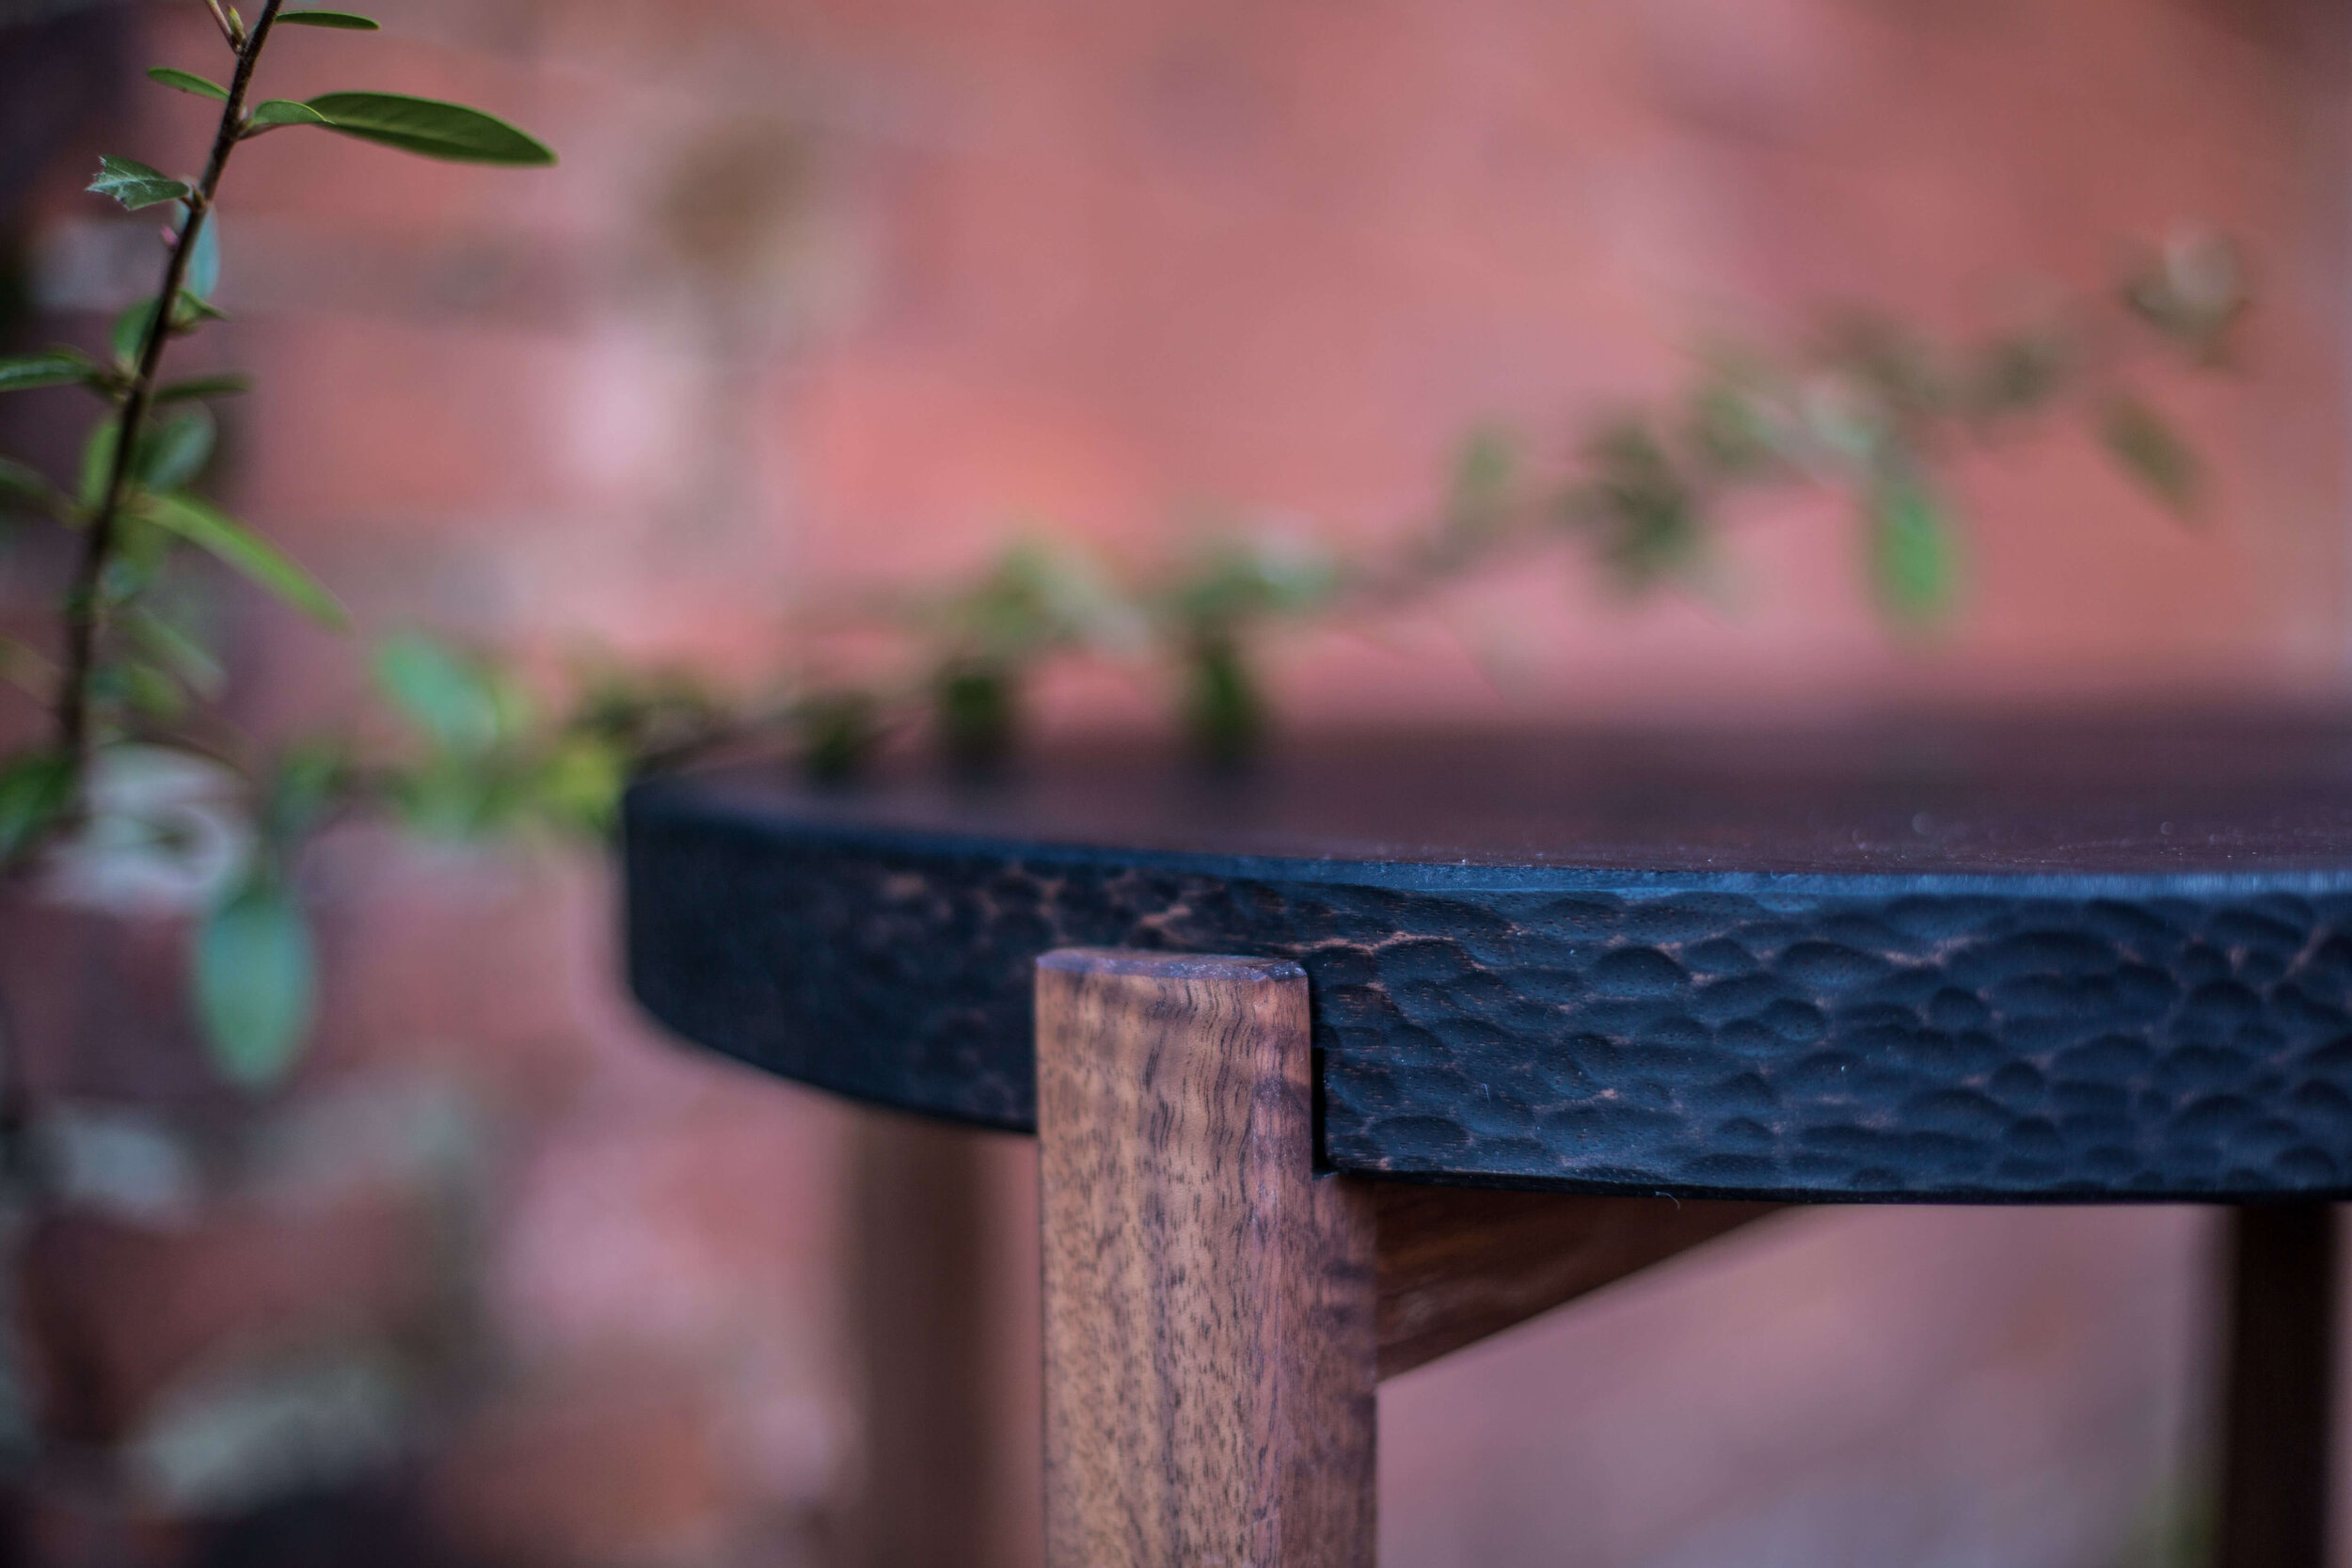 Alicia_Dietz_Modern_Concrete_Furniture_Carved_Wood_End_Table_Sofa_Table_Richmond_VA_6